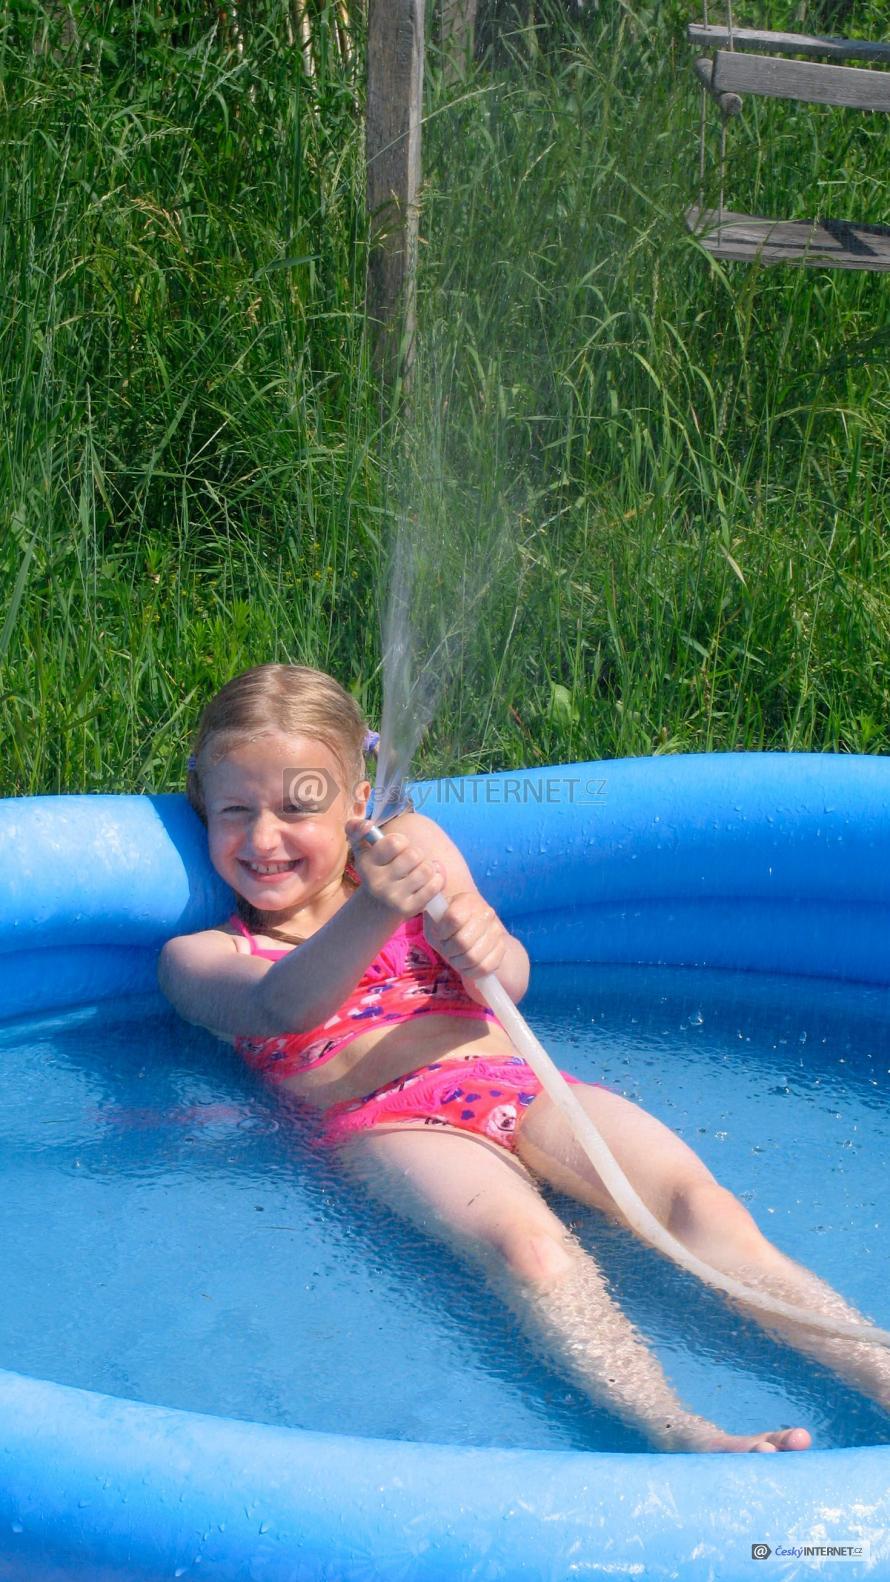 Holčička v nafukovacím bazénku.